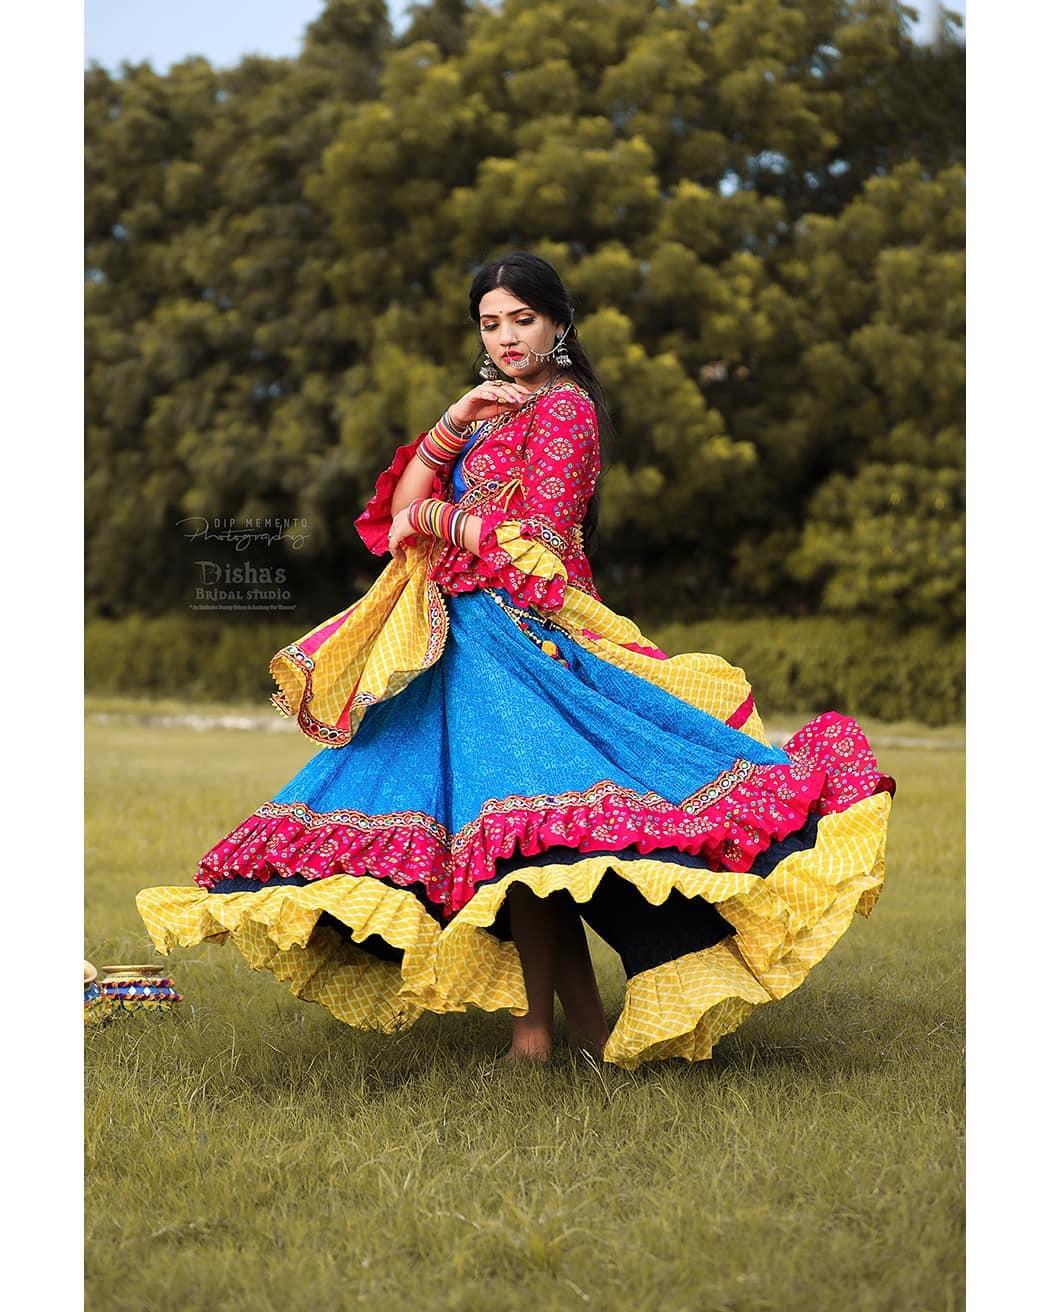 They labelled her I N S A N E because she T W I R E L E D on the nature's melody.. . . MUA: @dishapanchal246  Shoot: @dip_memento_photography  InFrame: @imug_pandey  Jewellery: @nancyhandicraft9 Costume by: @rashmithummar  #navratri2019 #photoshoot #ethnic #traditionalart #ahmedabad #gujarati  #pop #makeup #navratrichaniyacholi #chaniyacholi #indianfashionblogger  #fashionblogger #makeuptutorial #weddingdress #sexy#instagram #instapic #bollywood #bollywoodhotness #bollywoodactresses #indian #pic #picoftheday #photooftheday ##instagood#instamood #festivalofnations #festival